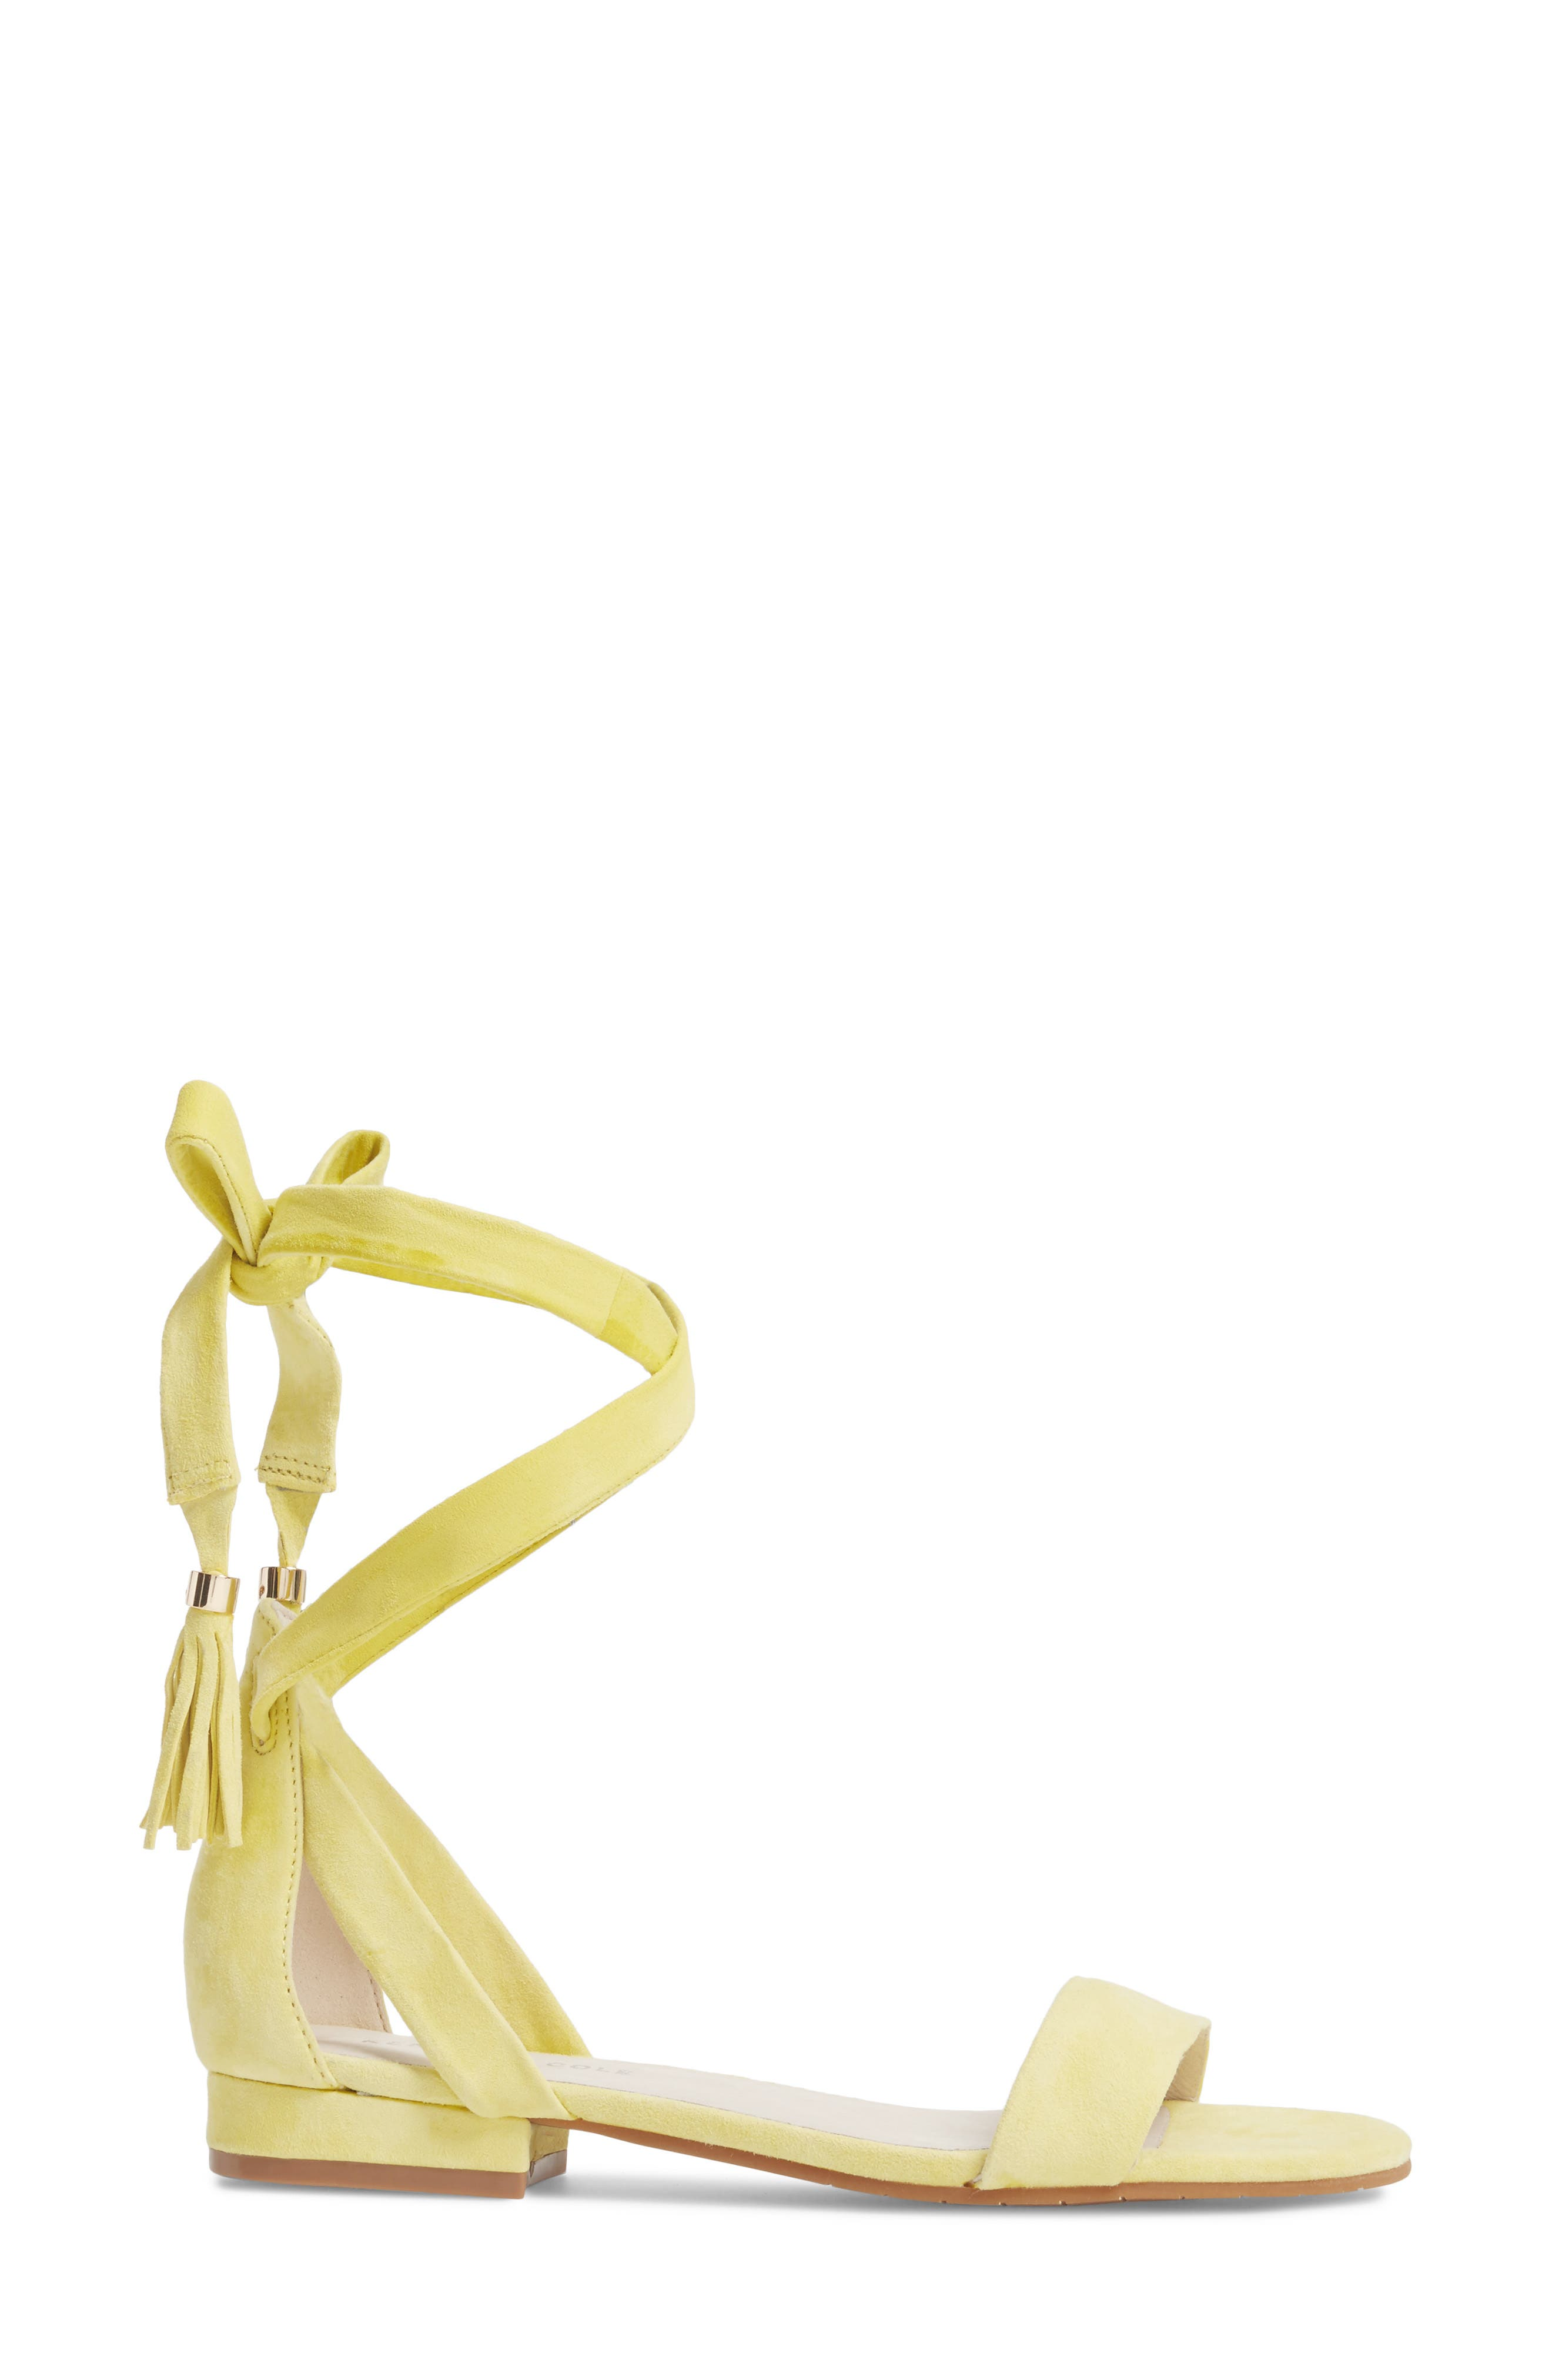 Valen Tassel Lace-Up Sandal,                             Alternate thumbnail 30, color,